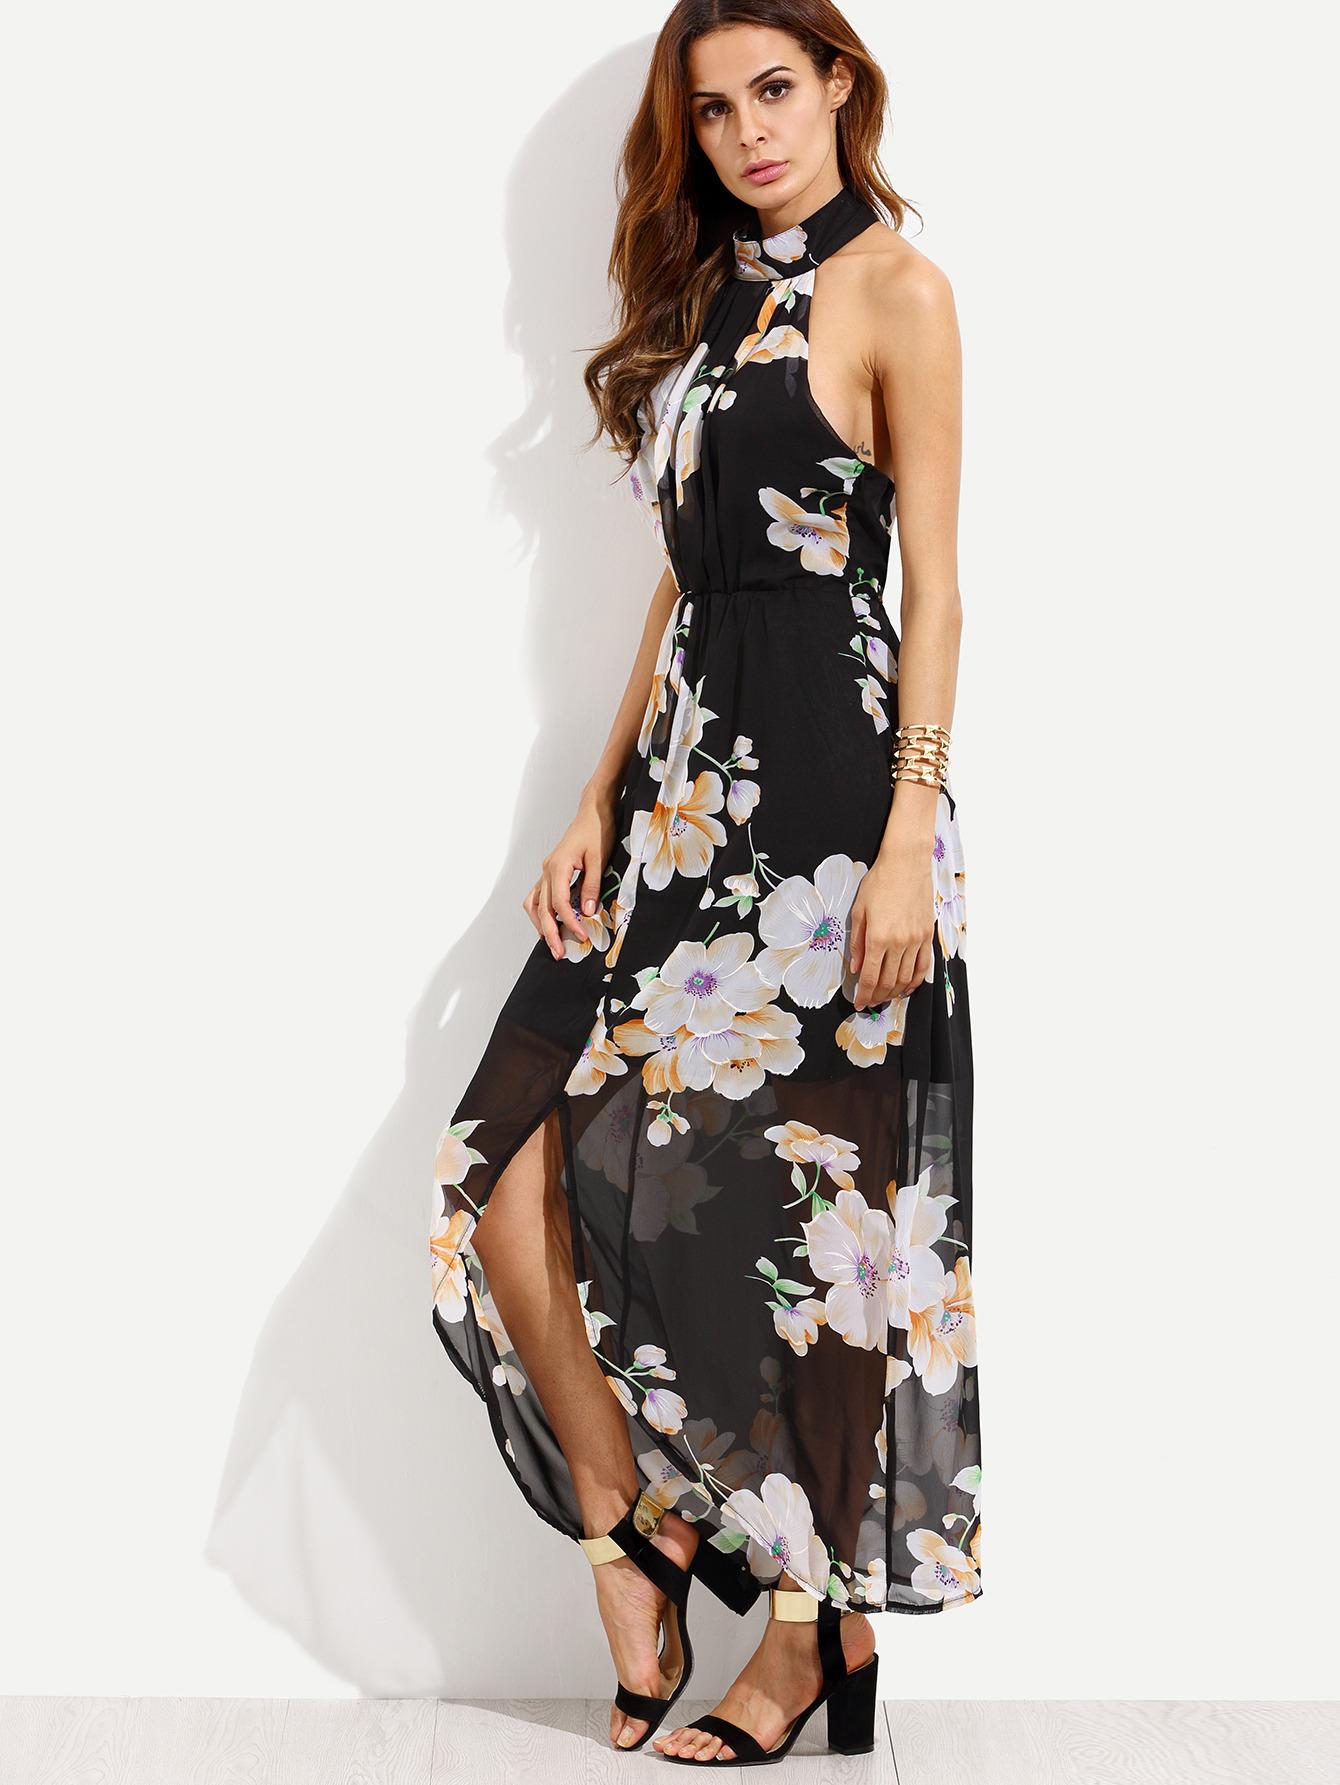 dd3a8a26b2 Shop Black Flower Print Halter Neck Slit Chiffon Dress online. SheIn offers…